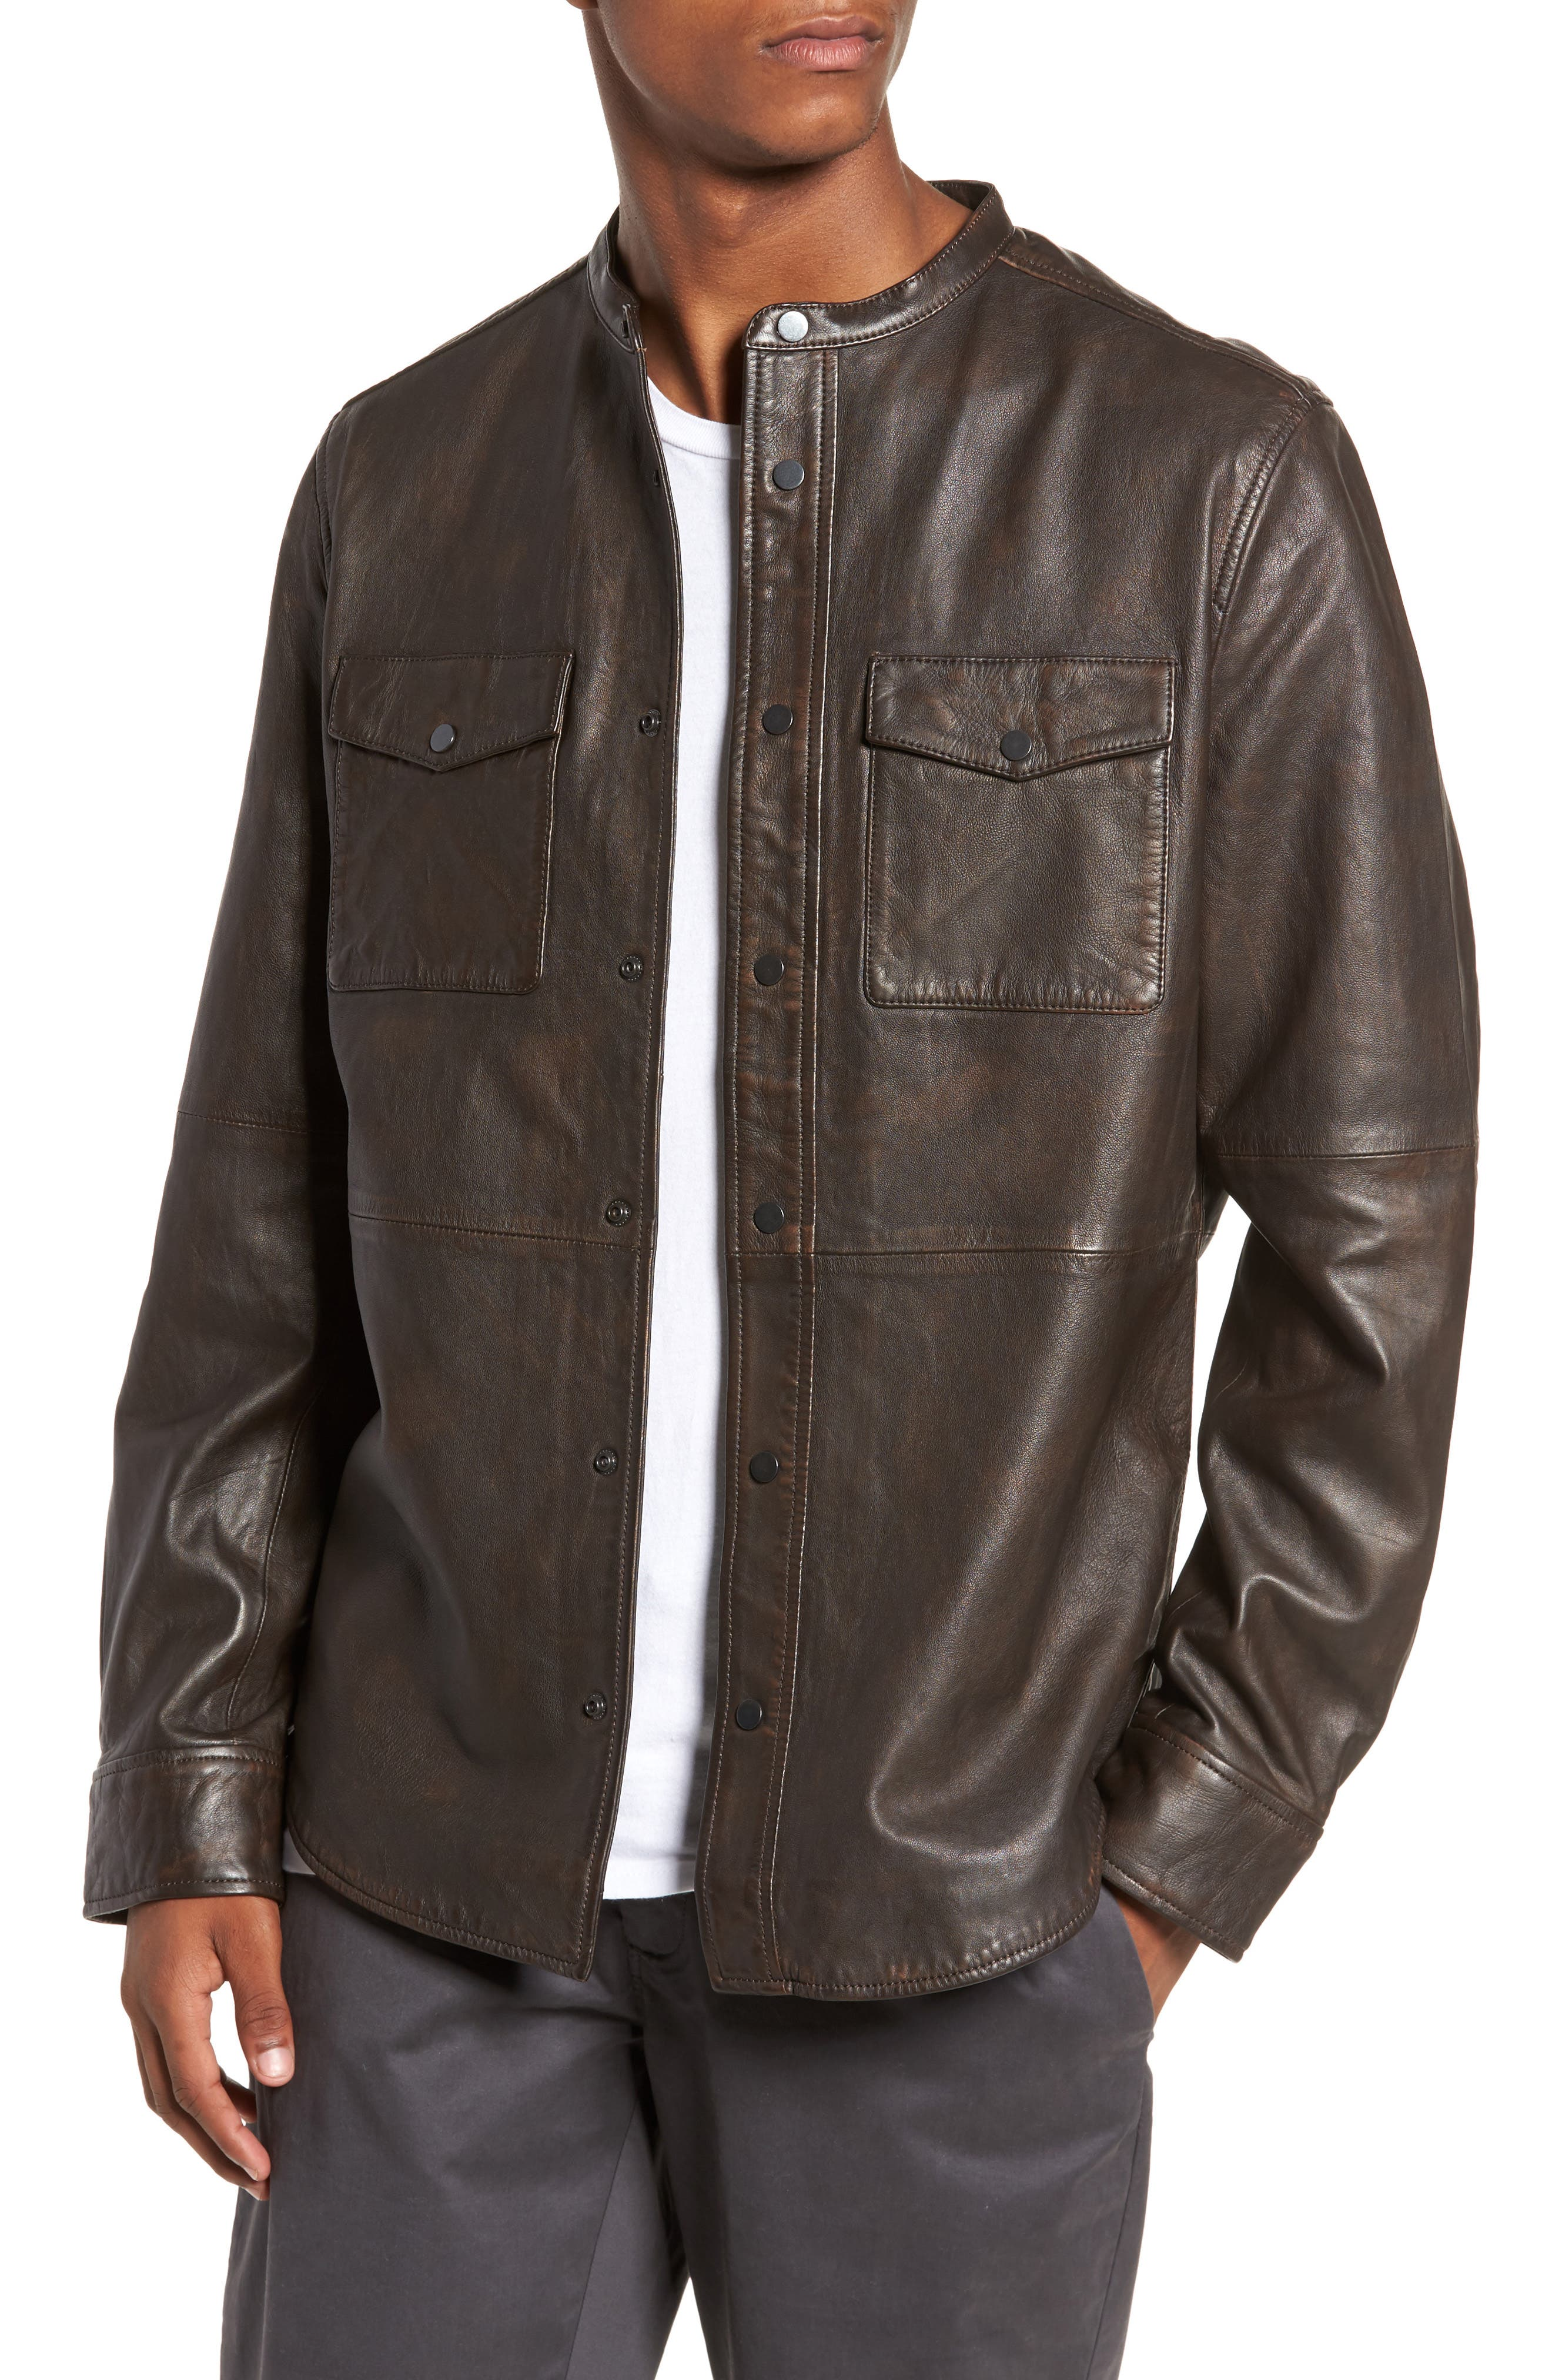 Treasure & Bond Atwater Leather Shirt Jacket